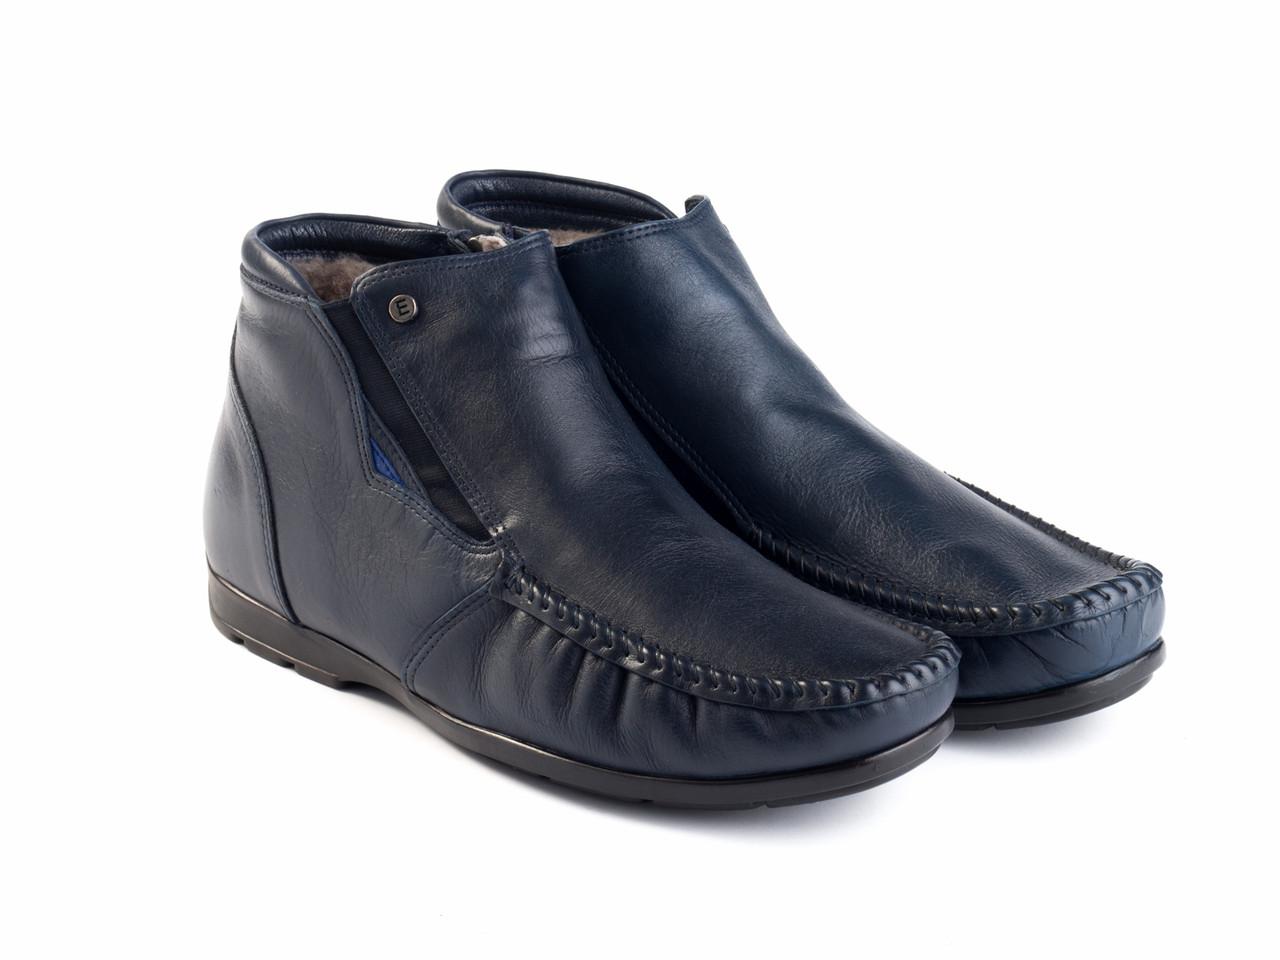 Ботинки Etor 14668-7383-578 40 синие